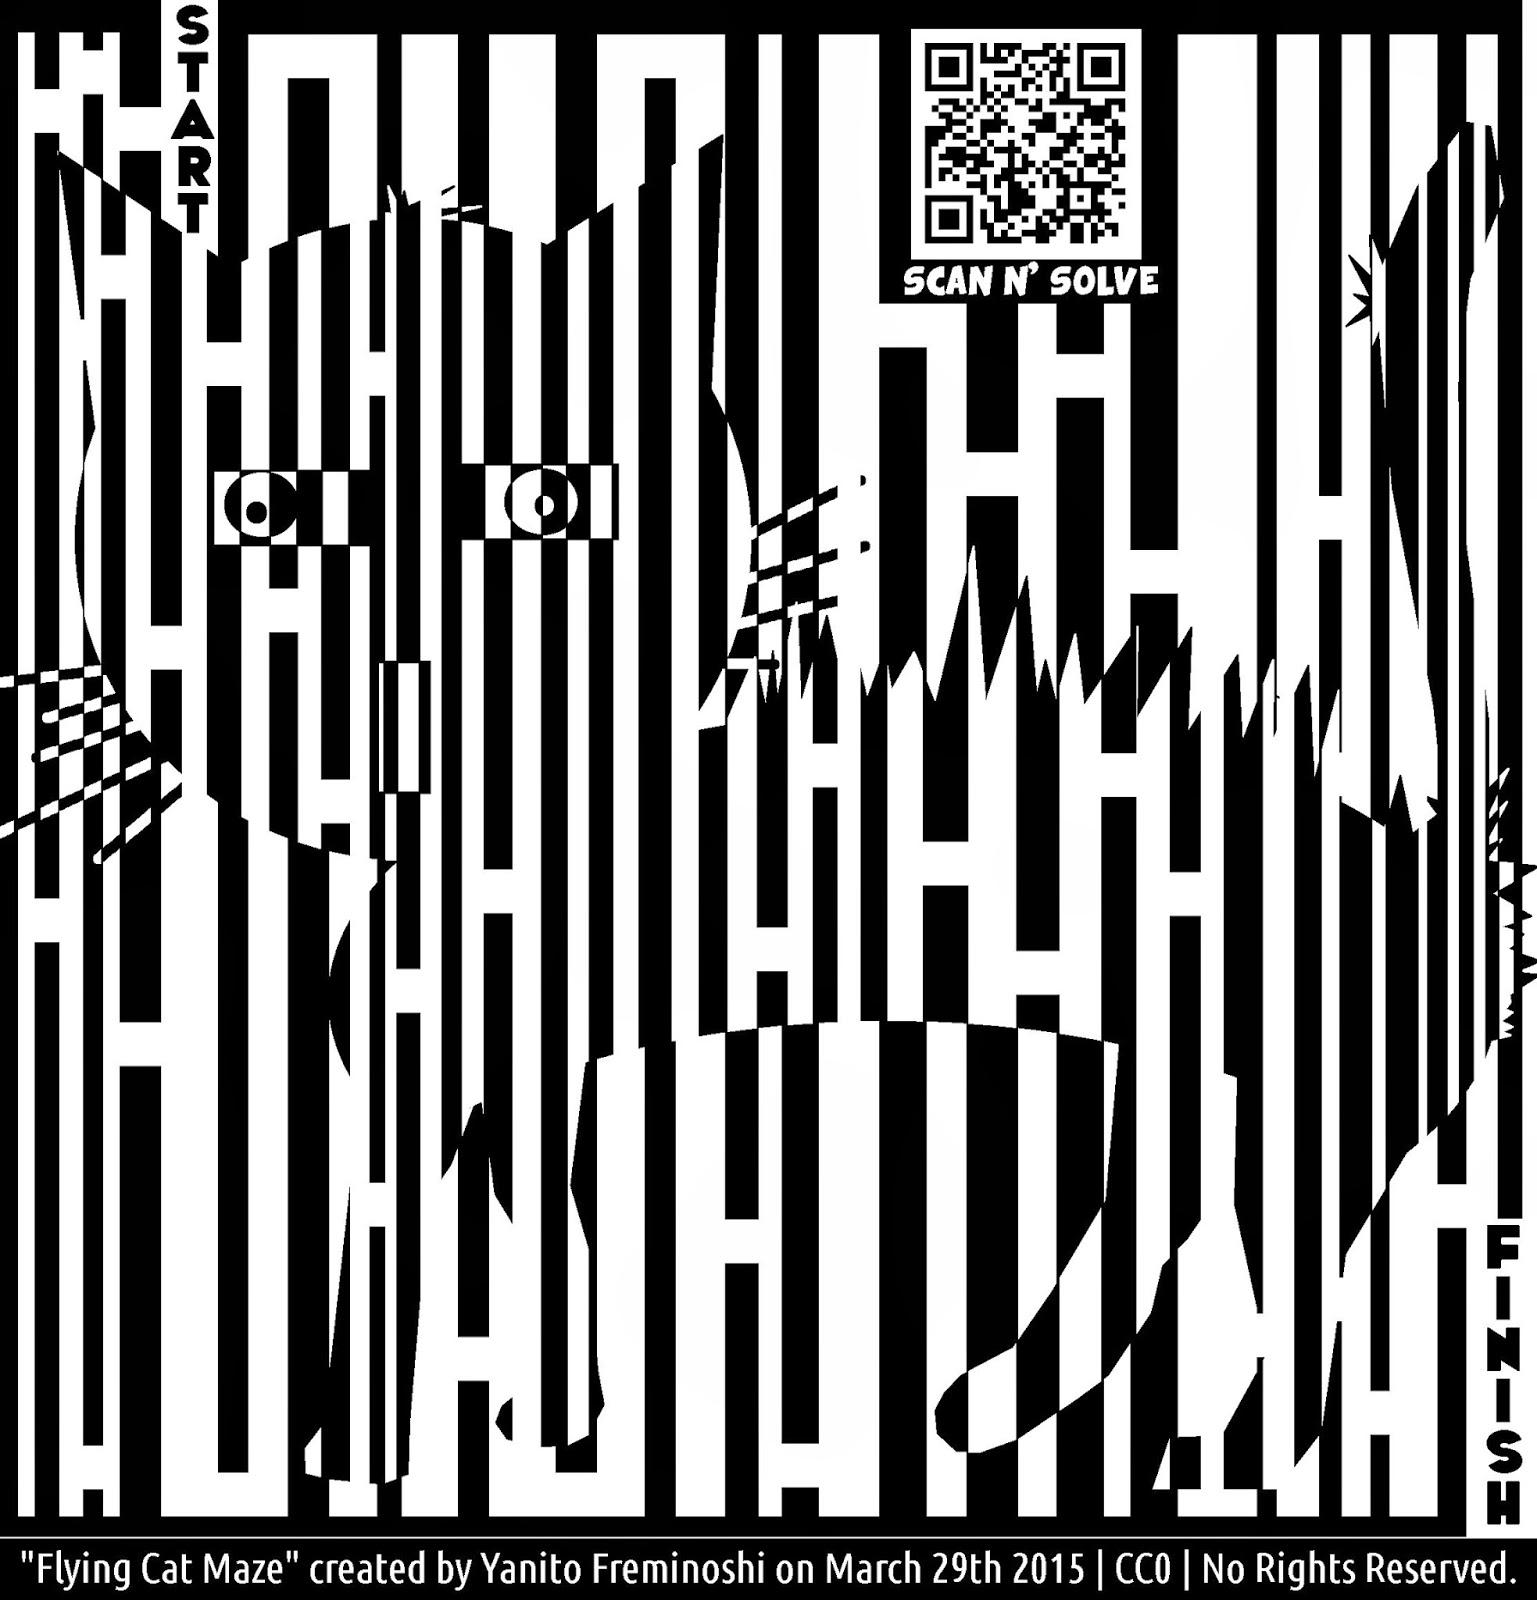 Flying Cat Maze